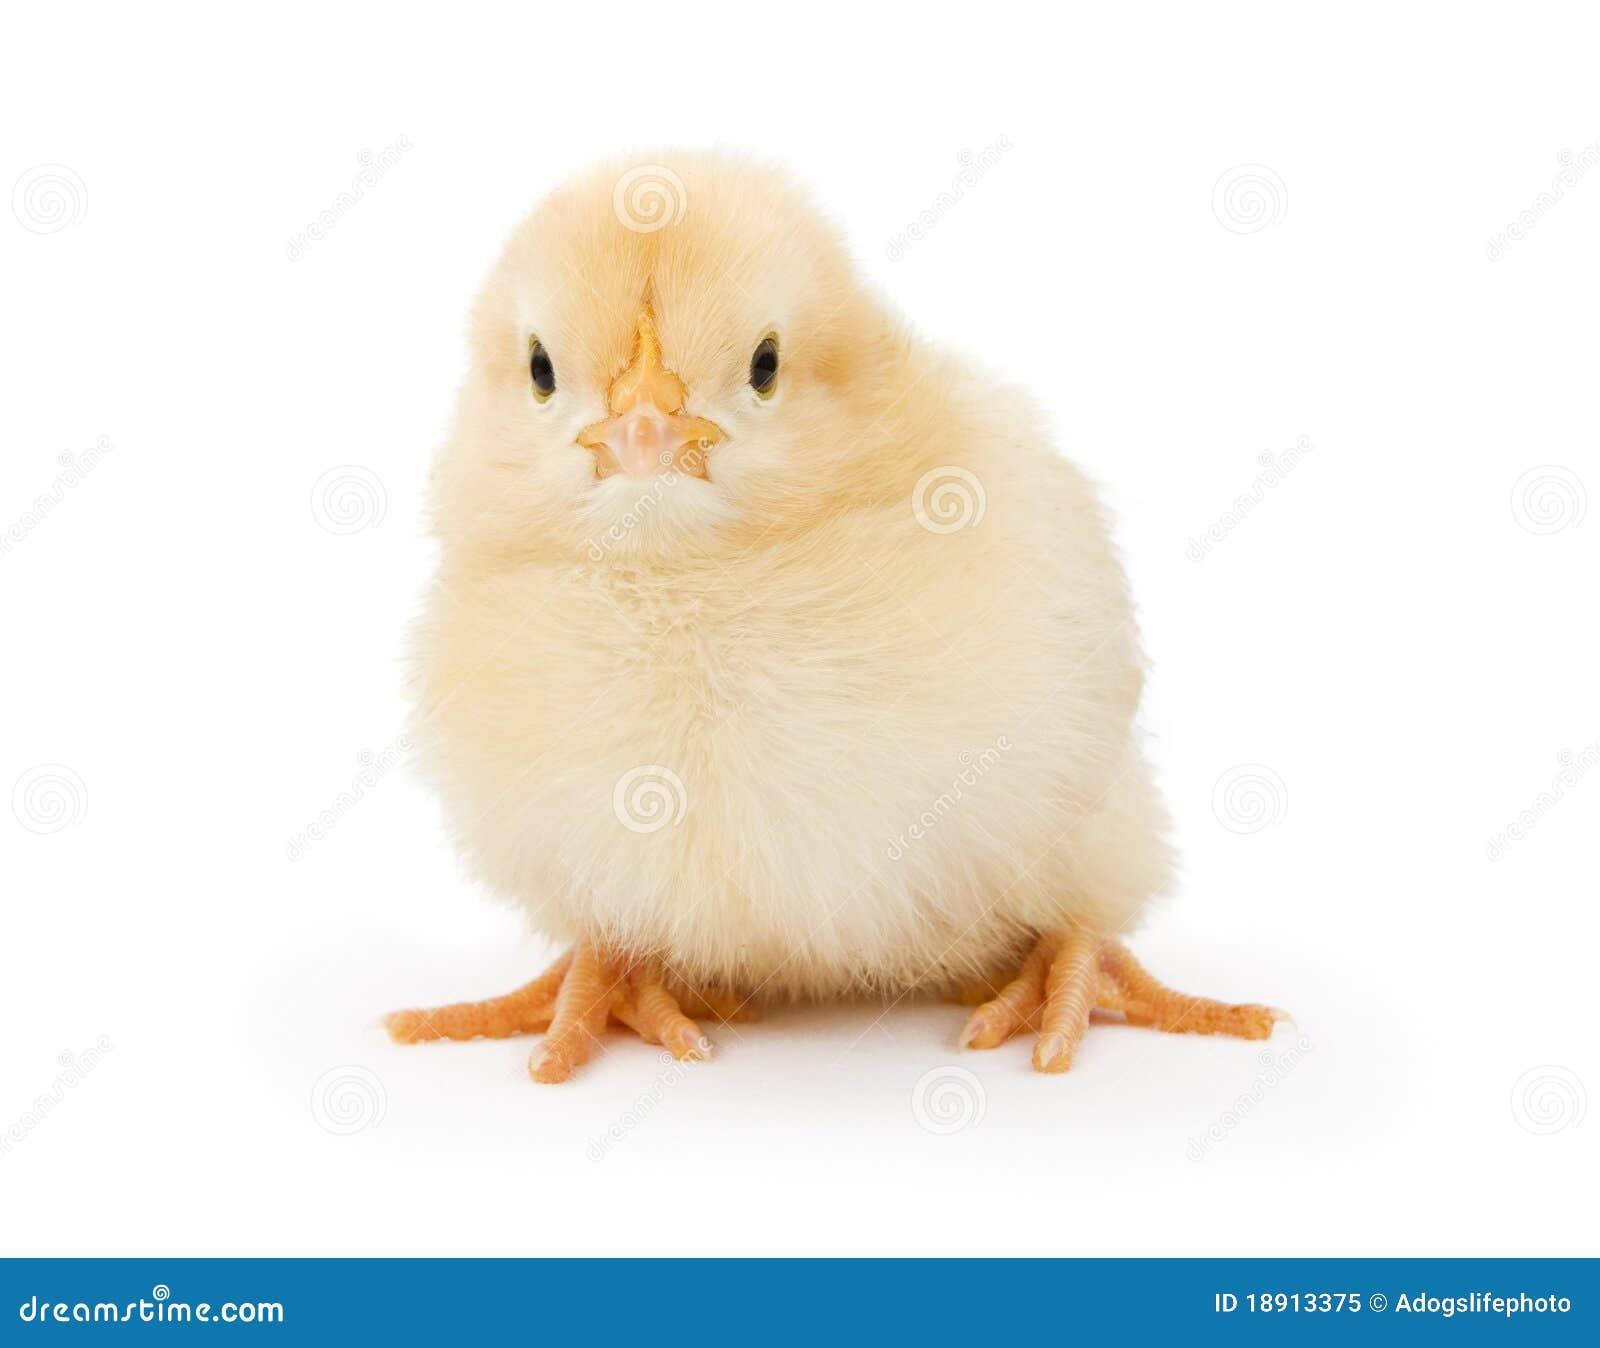 White Baby Chickens